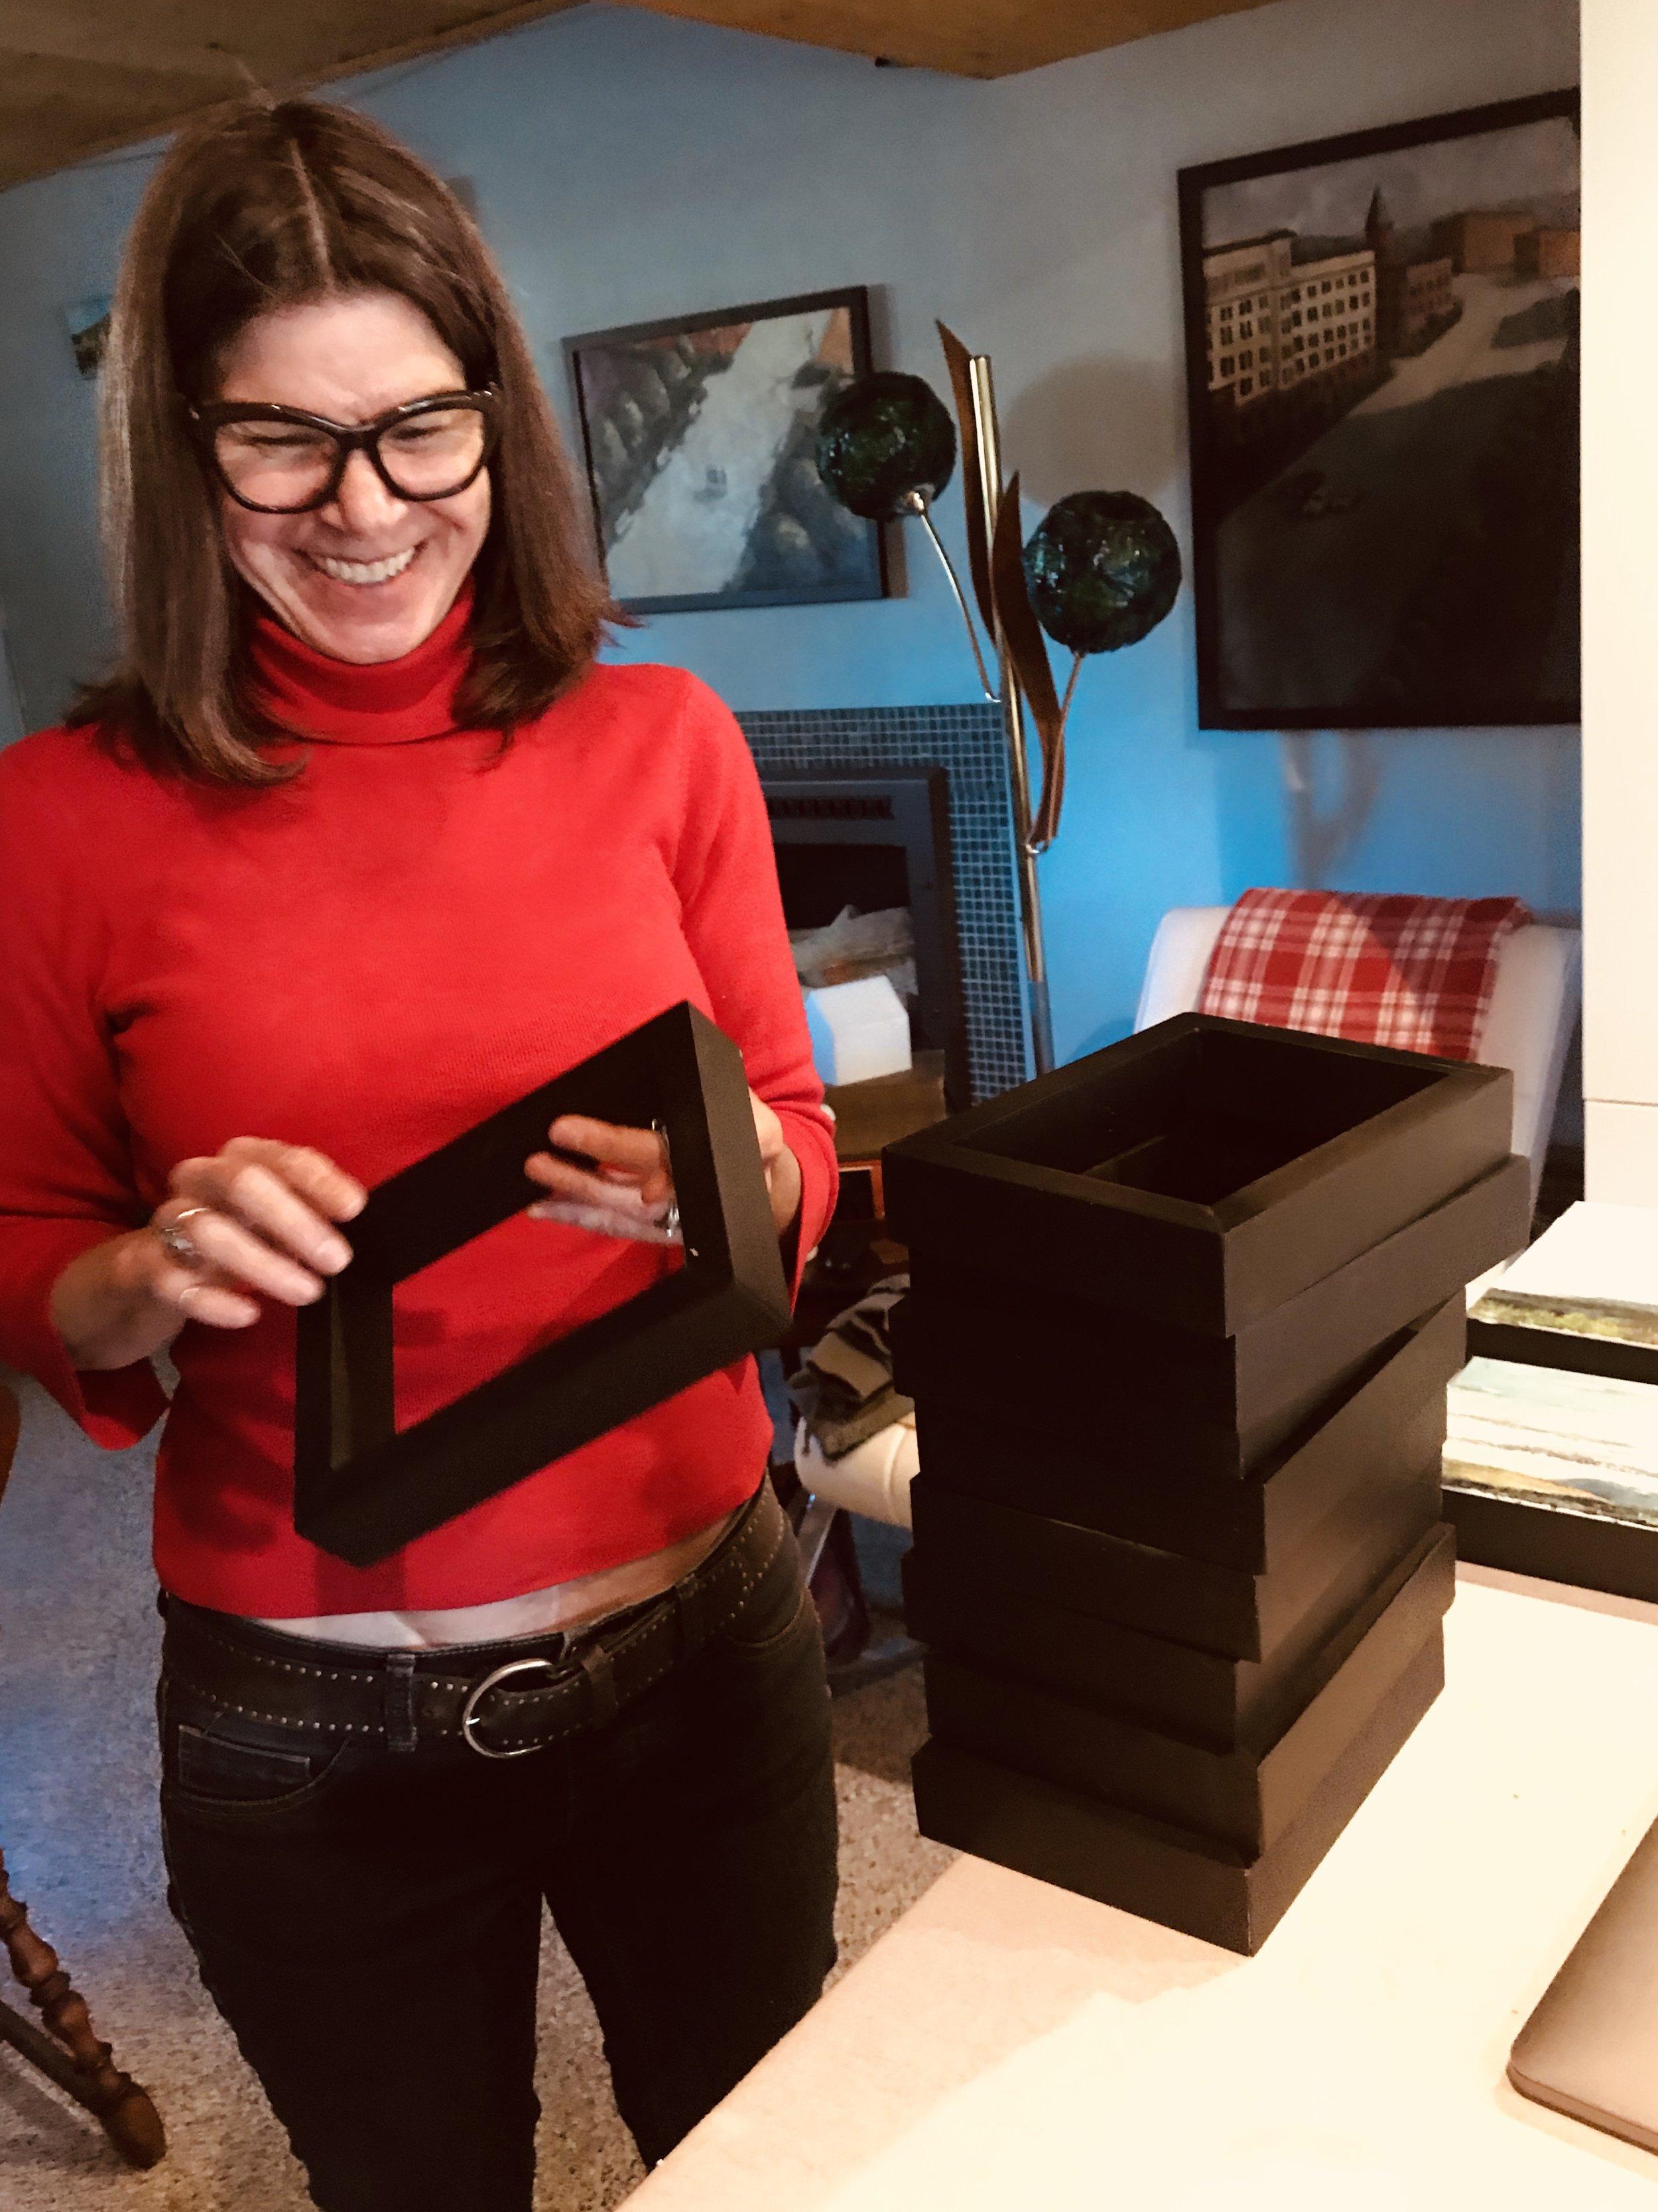 The frames that Rebekah and her husband, Alex, make together.